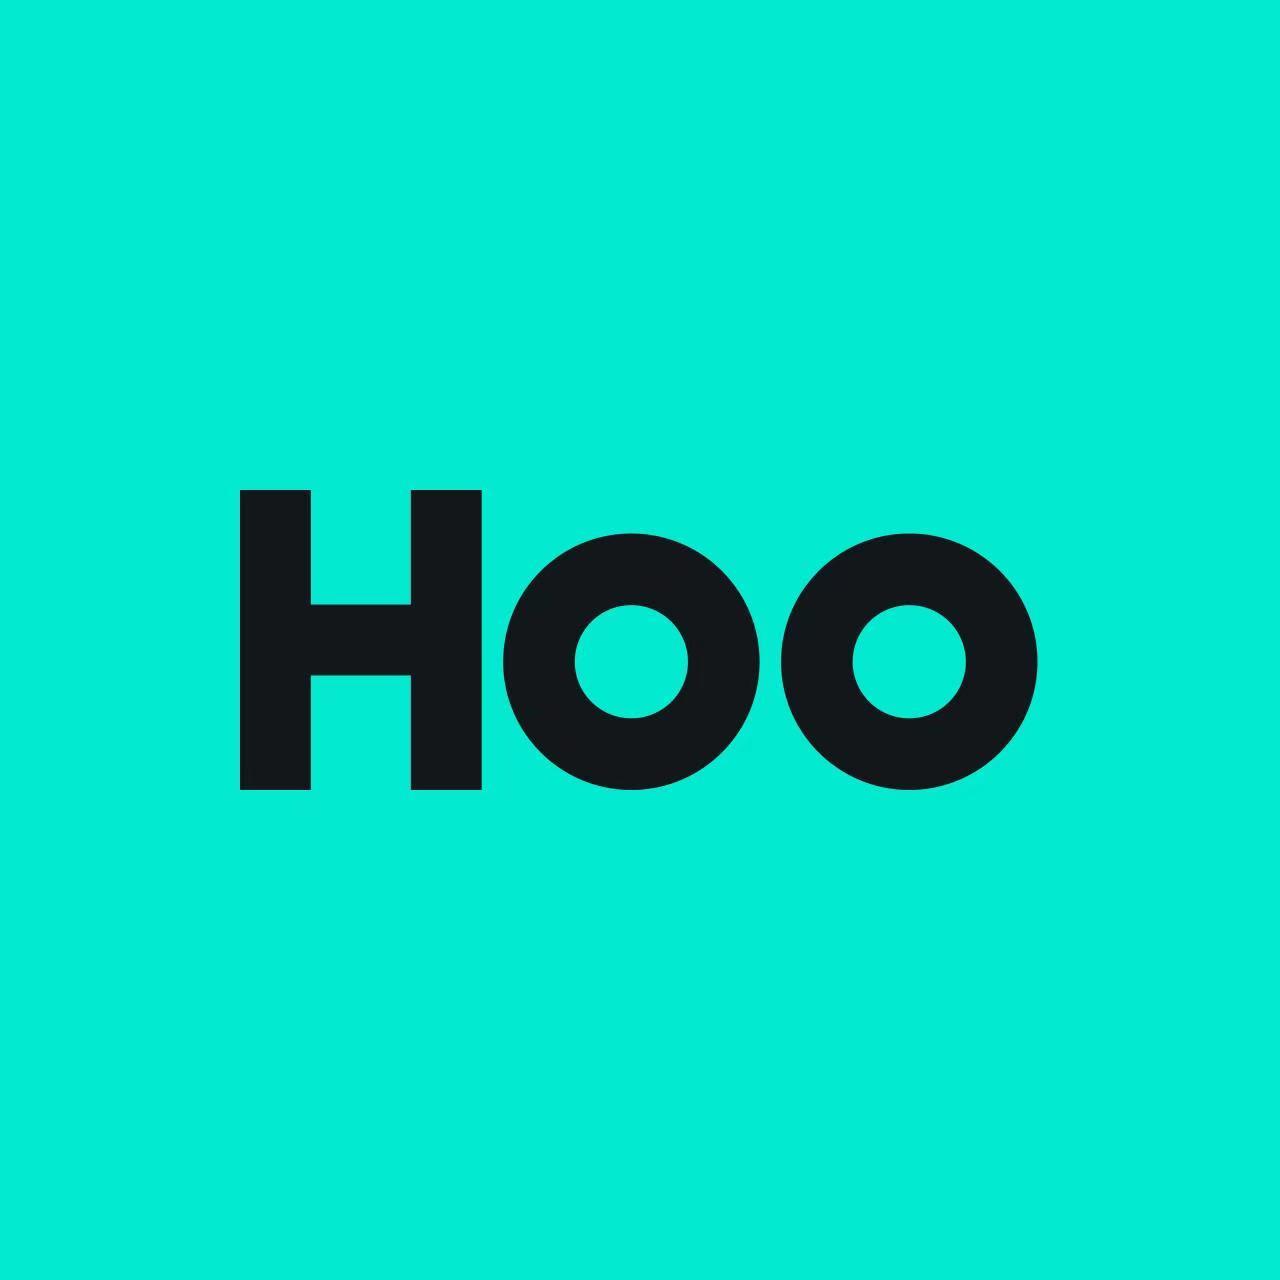 Hoo虎符